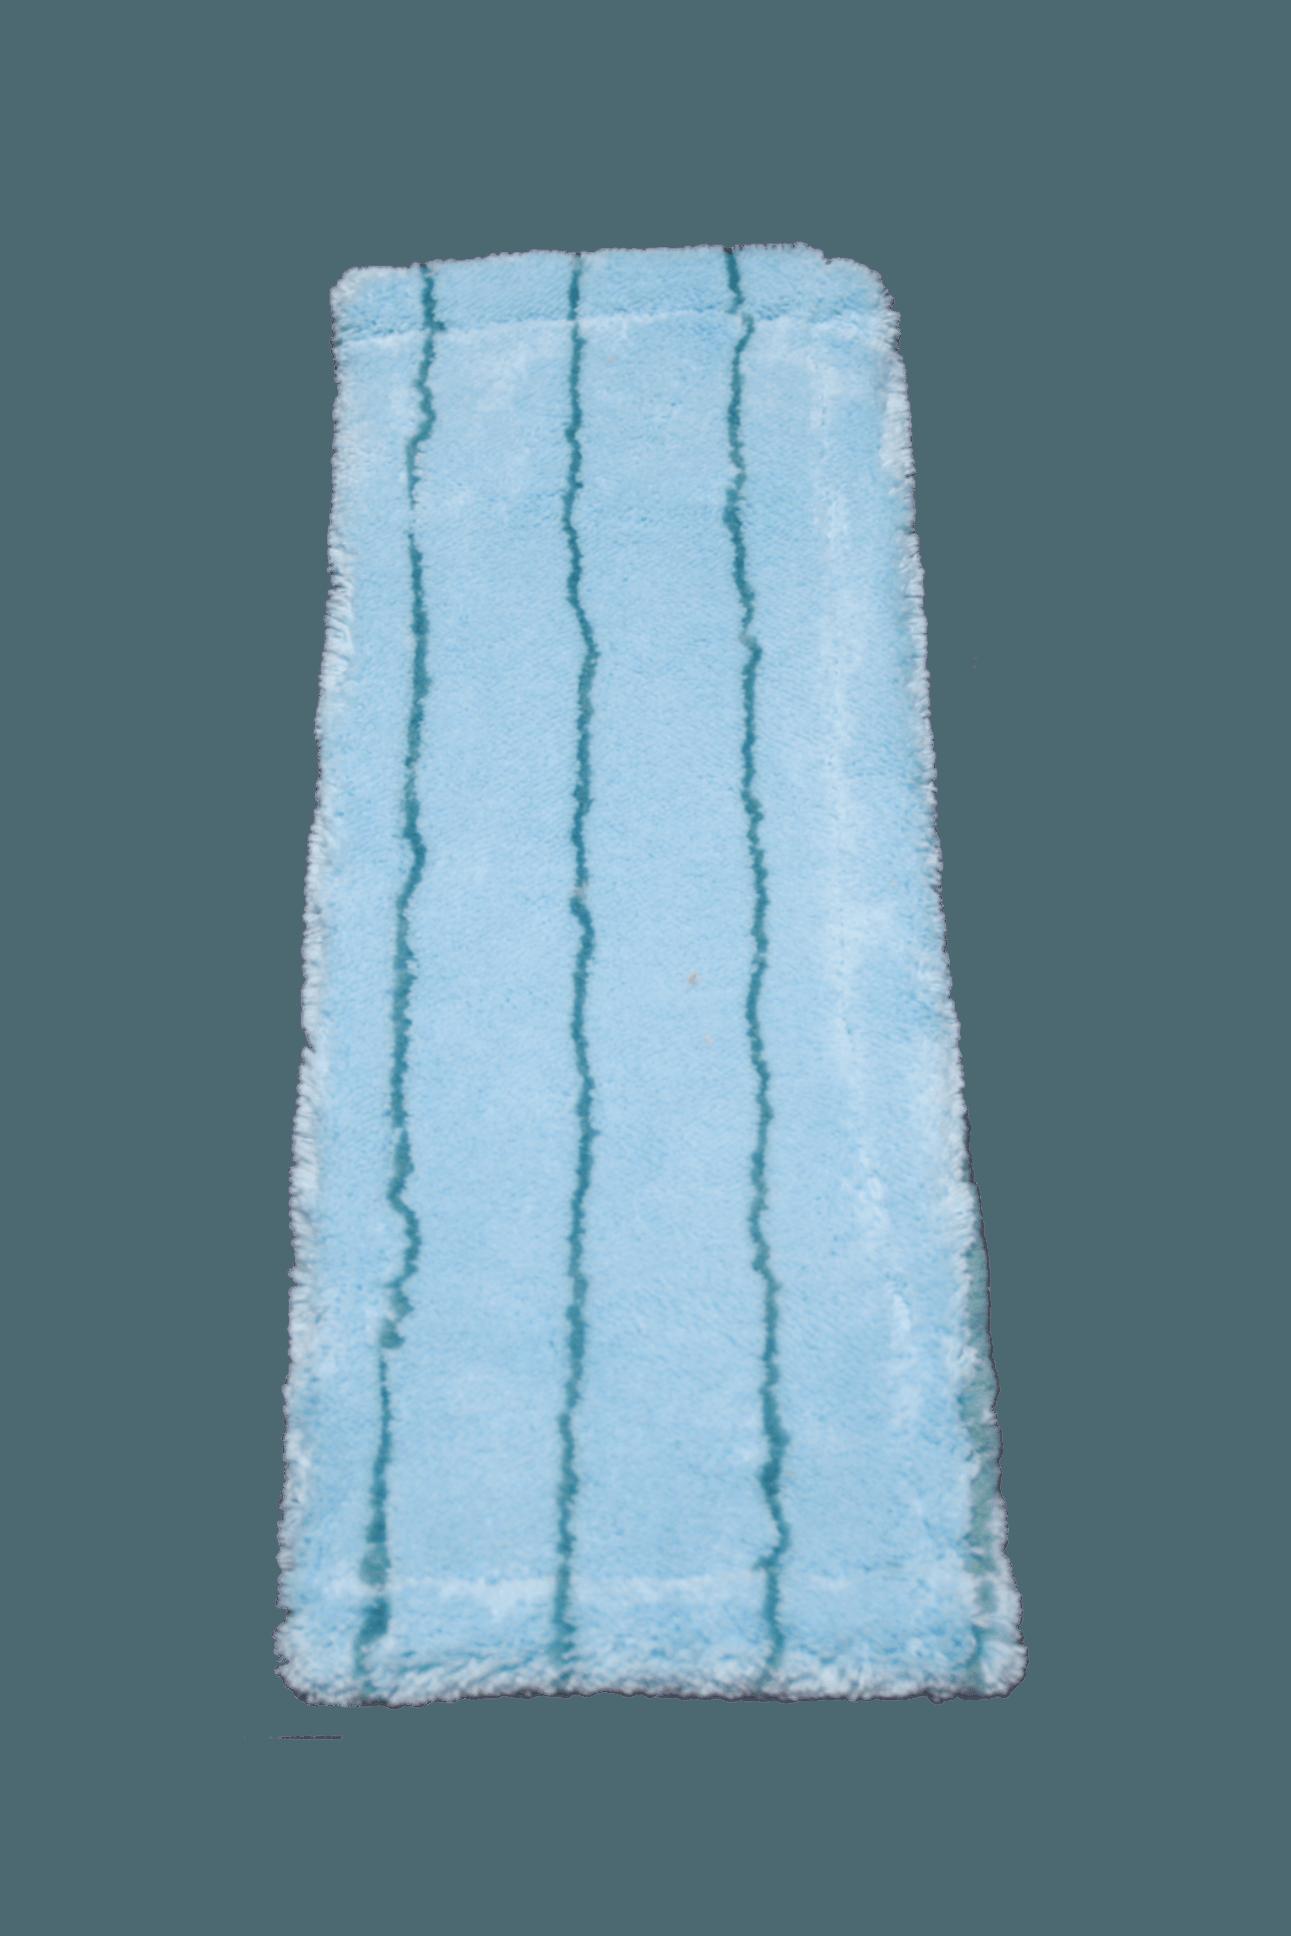 aqua clean microfaser bodenmopp mit borstenstreifen 40cm bodent cher bodenmopps microfaser. Black Bedroom Furniture Sets. Home Design Ideas